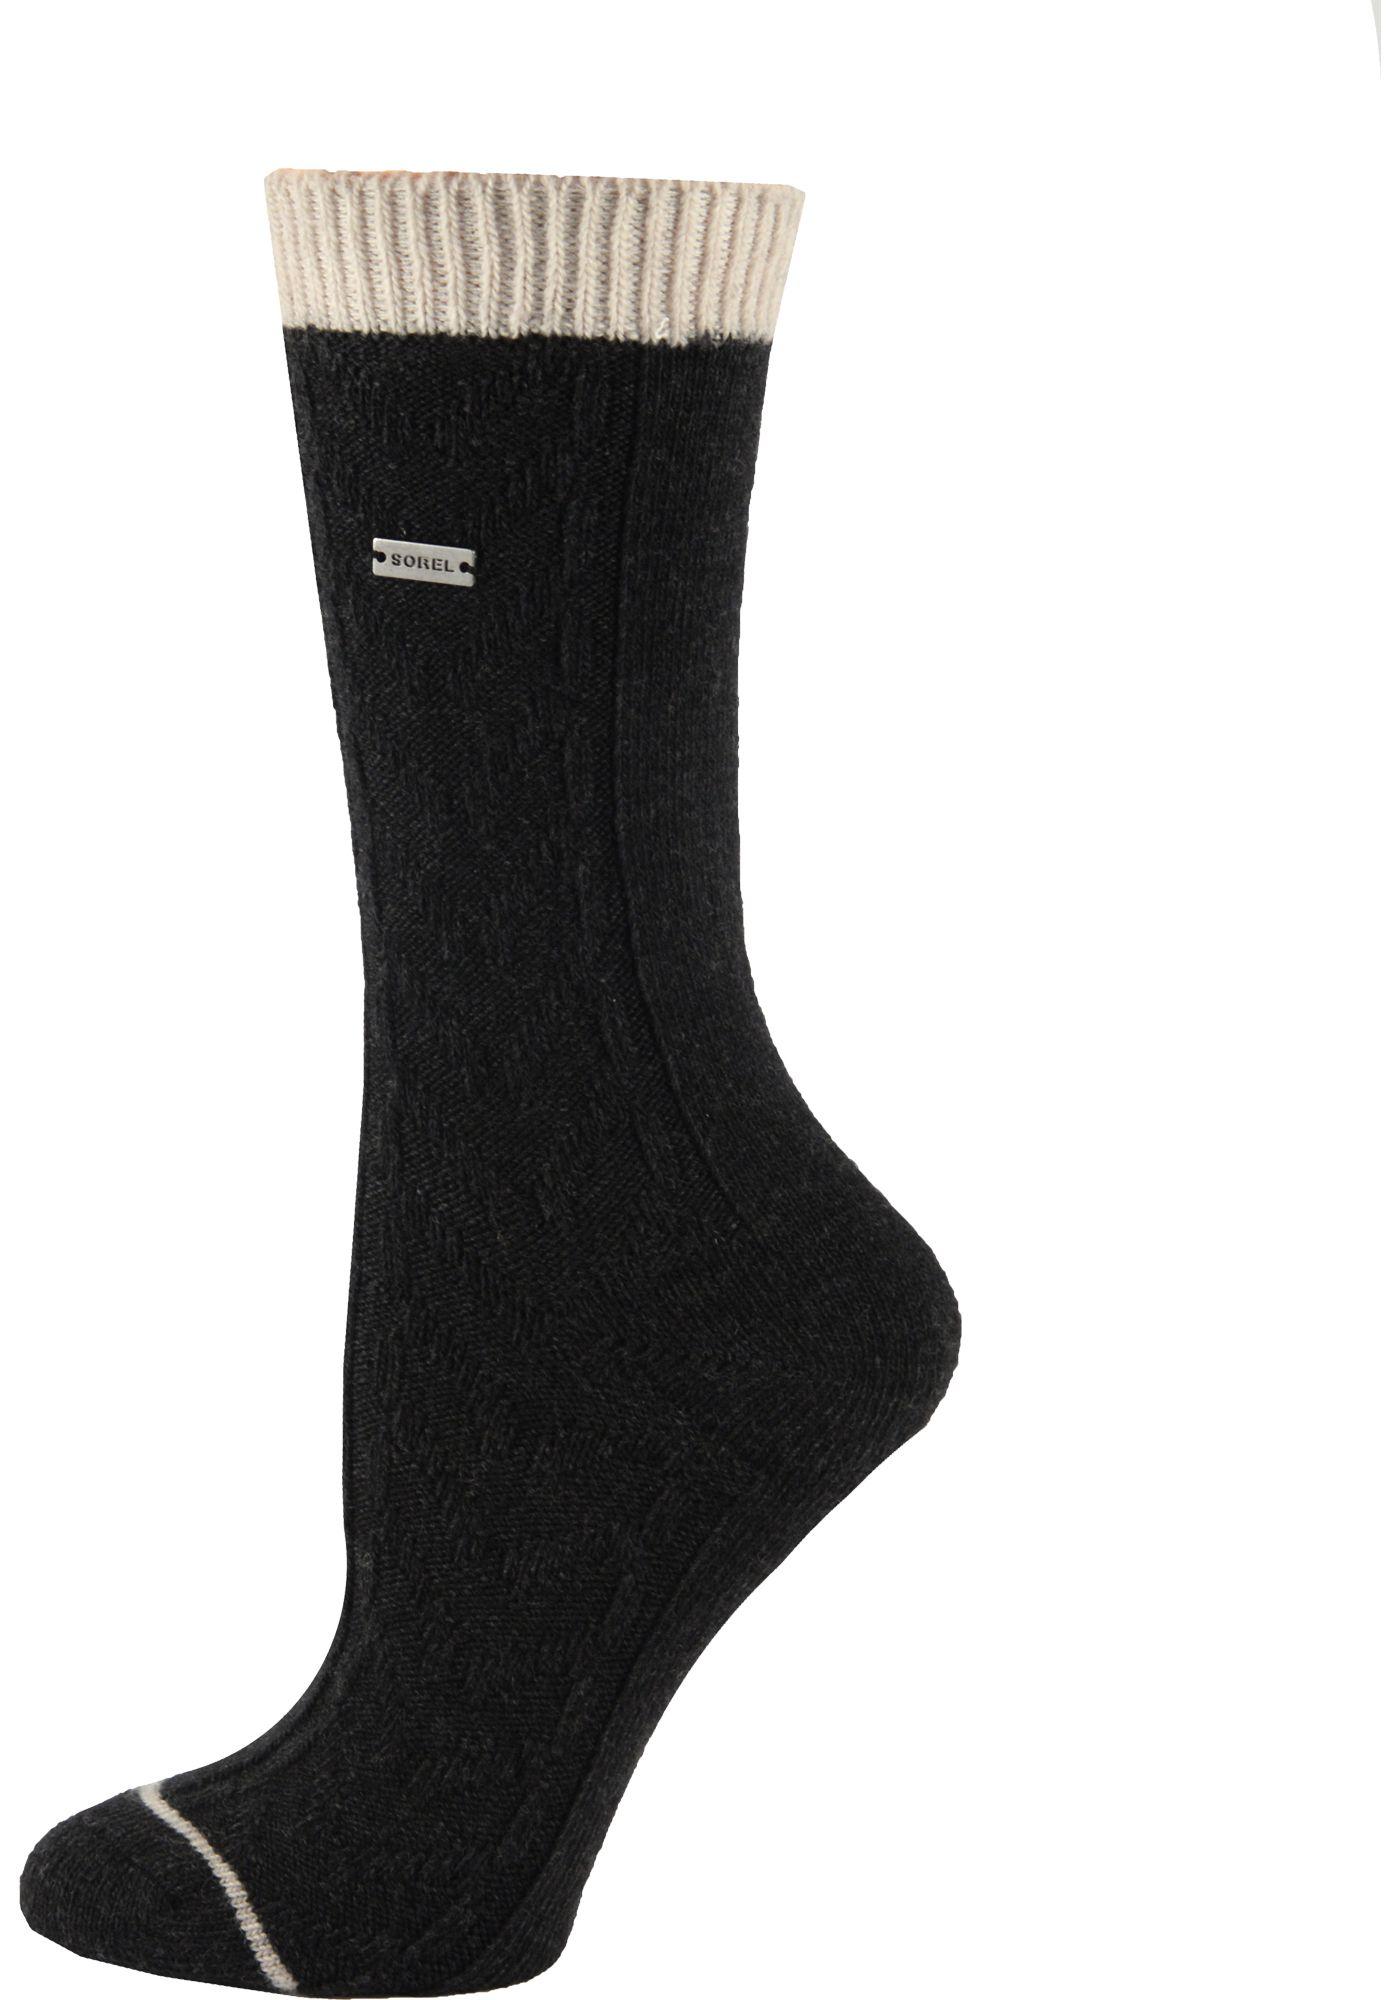 SOREL Women's Wool Novelty Cable Crew Socks